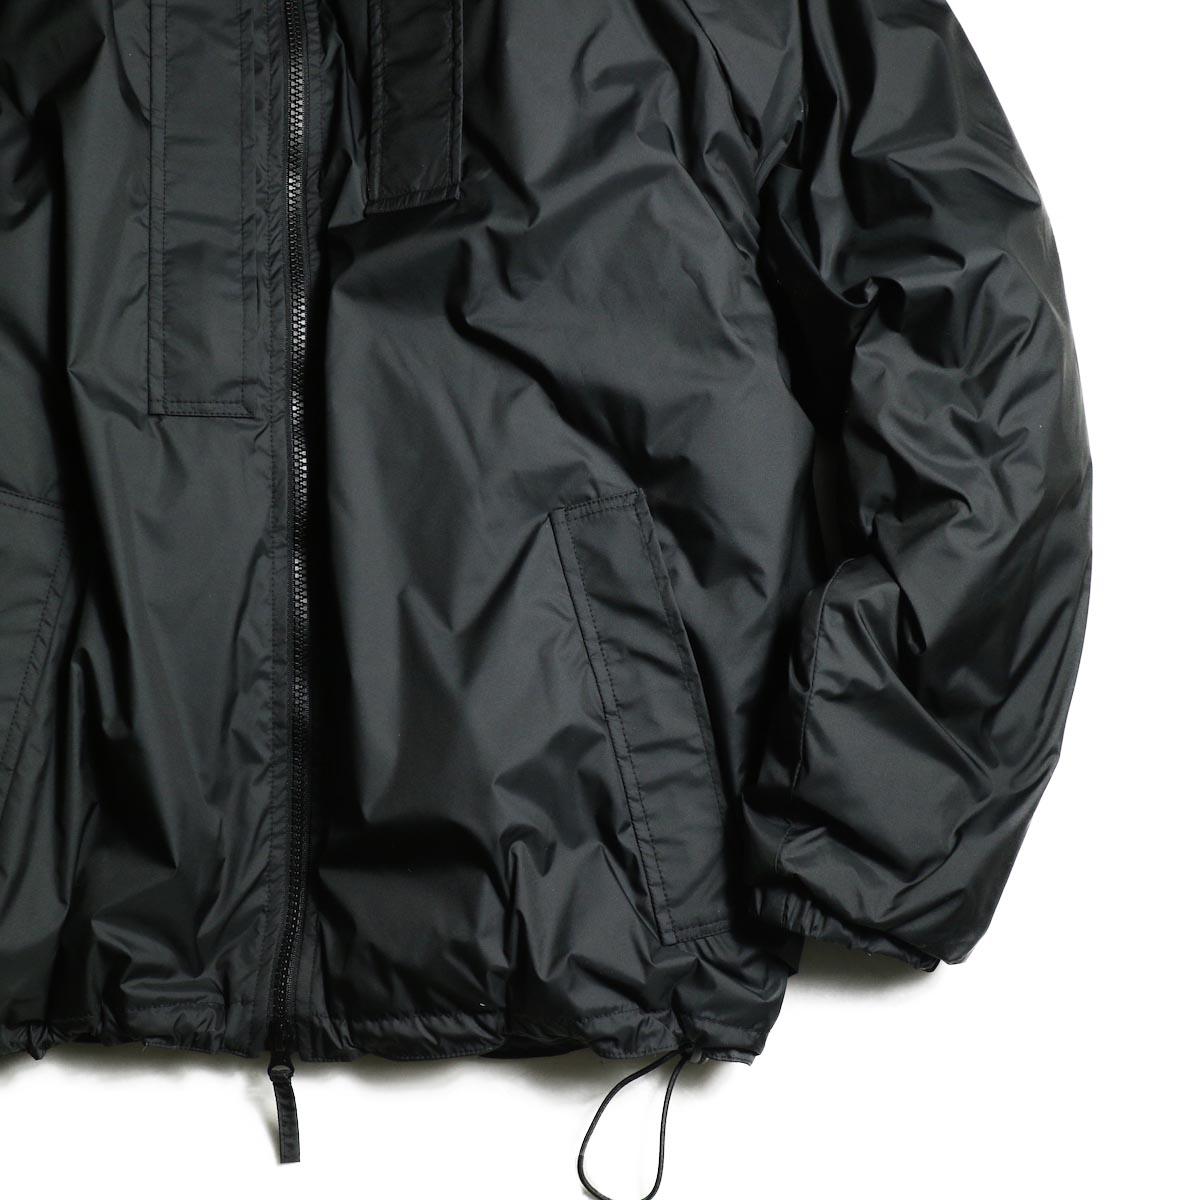 J&S Franklin / BRITISH ARMY PCS LIGHT WEIGHT DOWN JACKET (Black) 袖、裾